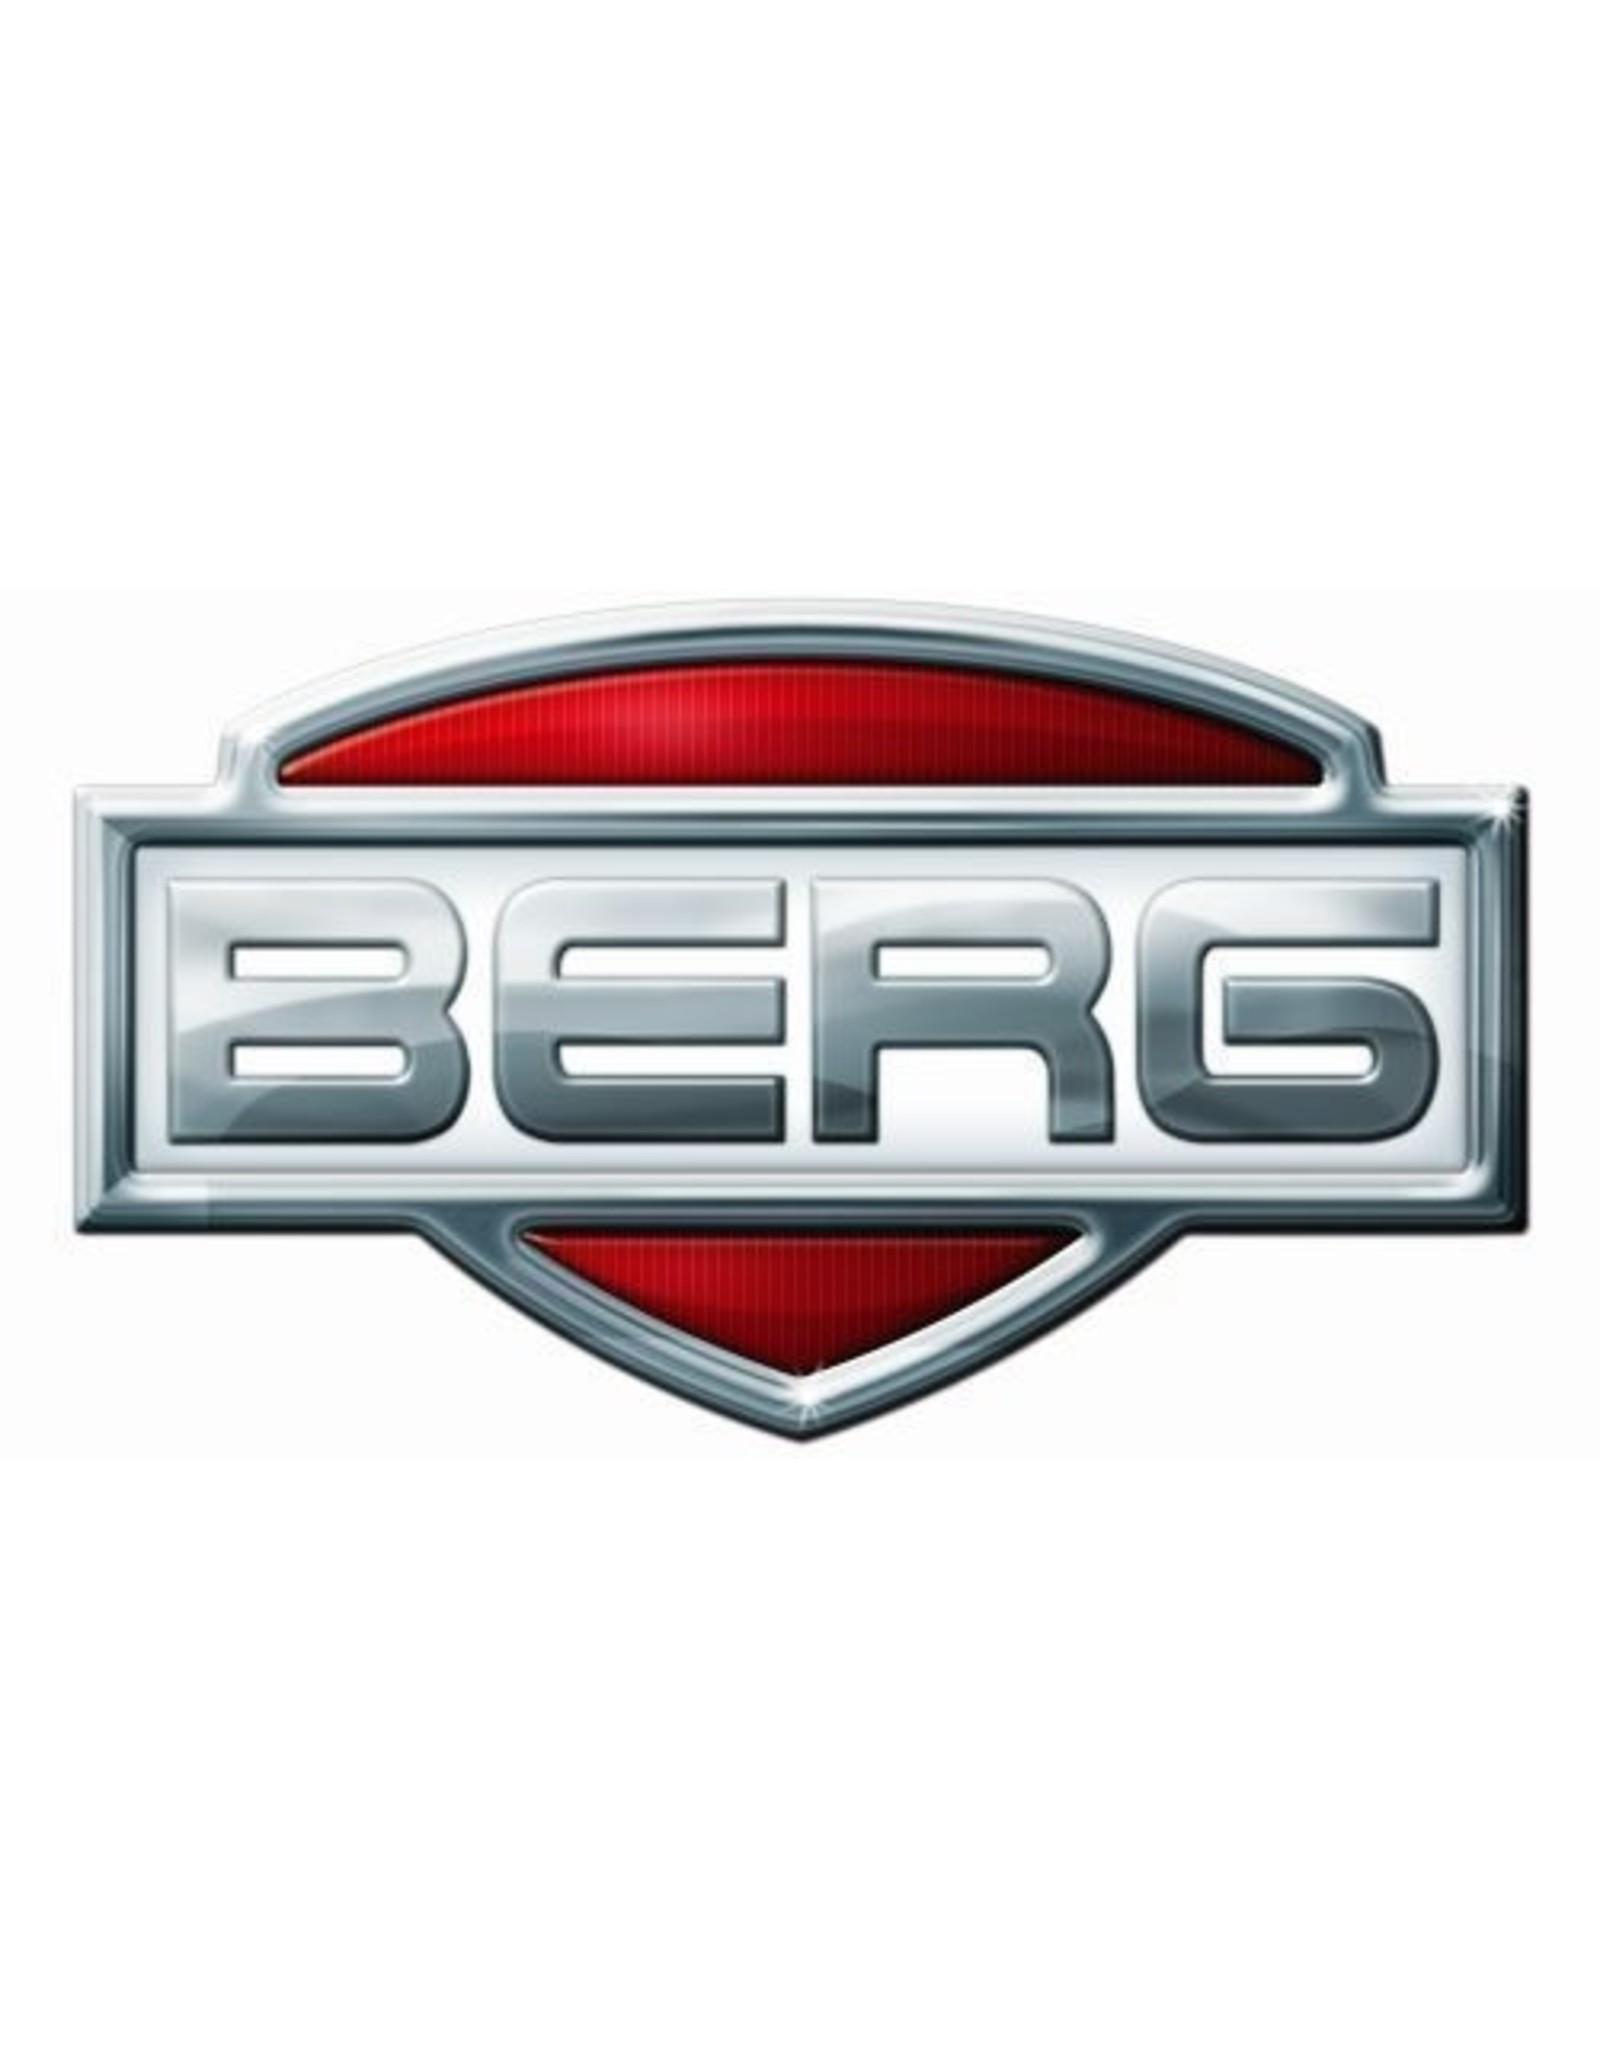 BERG BERG Ultim Afdekhoes Extra  330 Groen - EazyFit